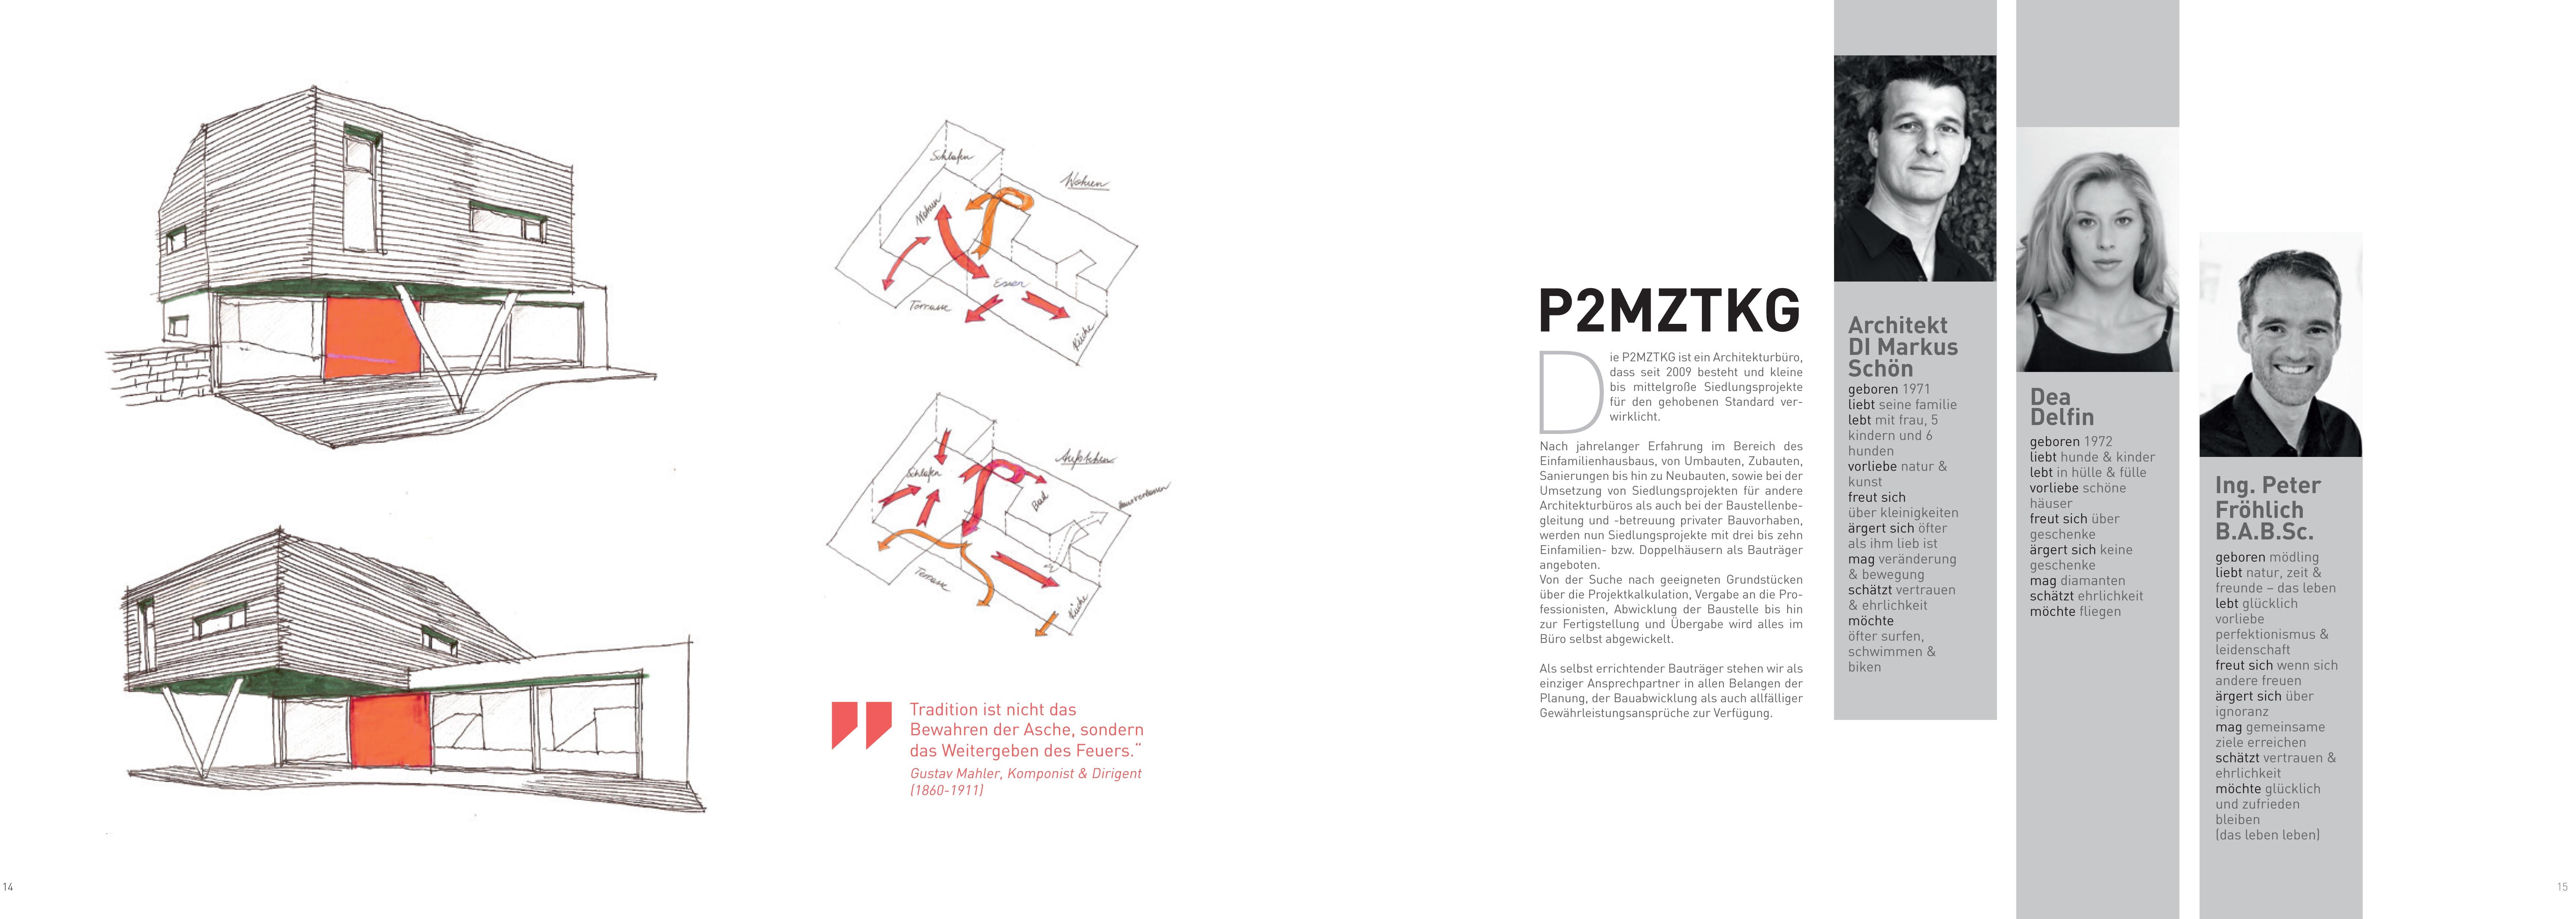 p2mztkg